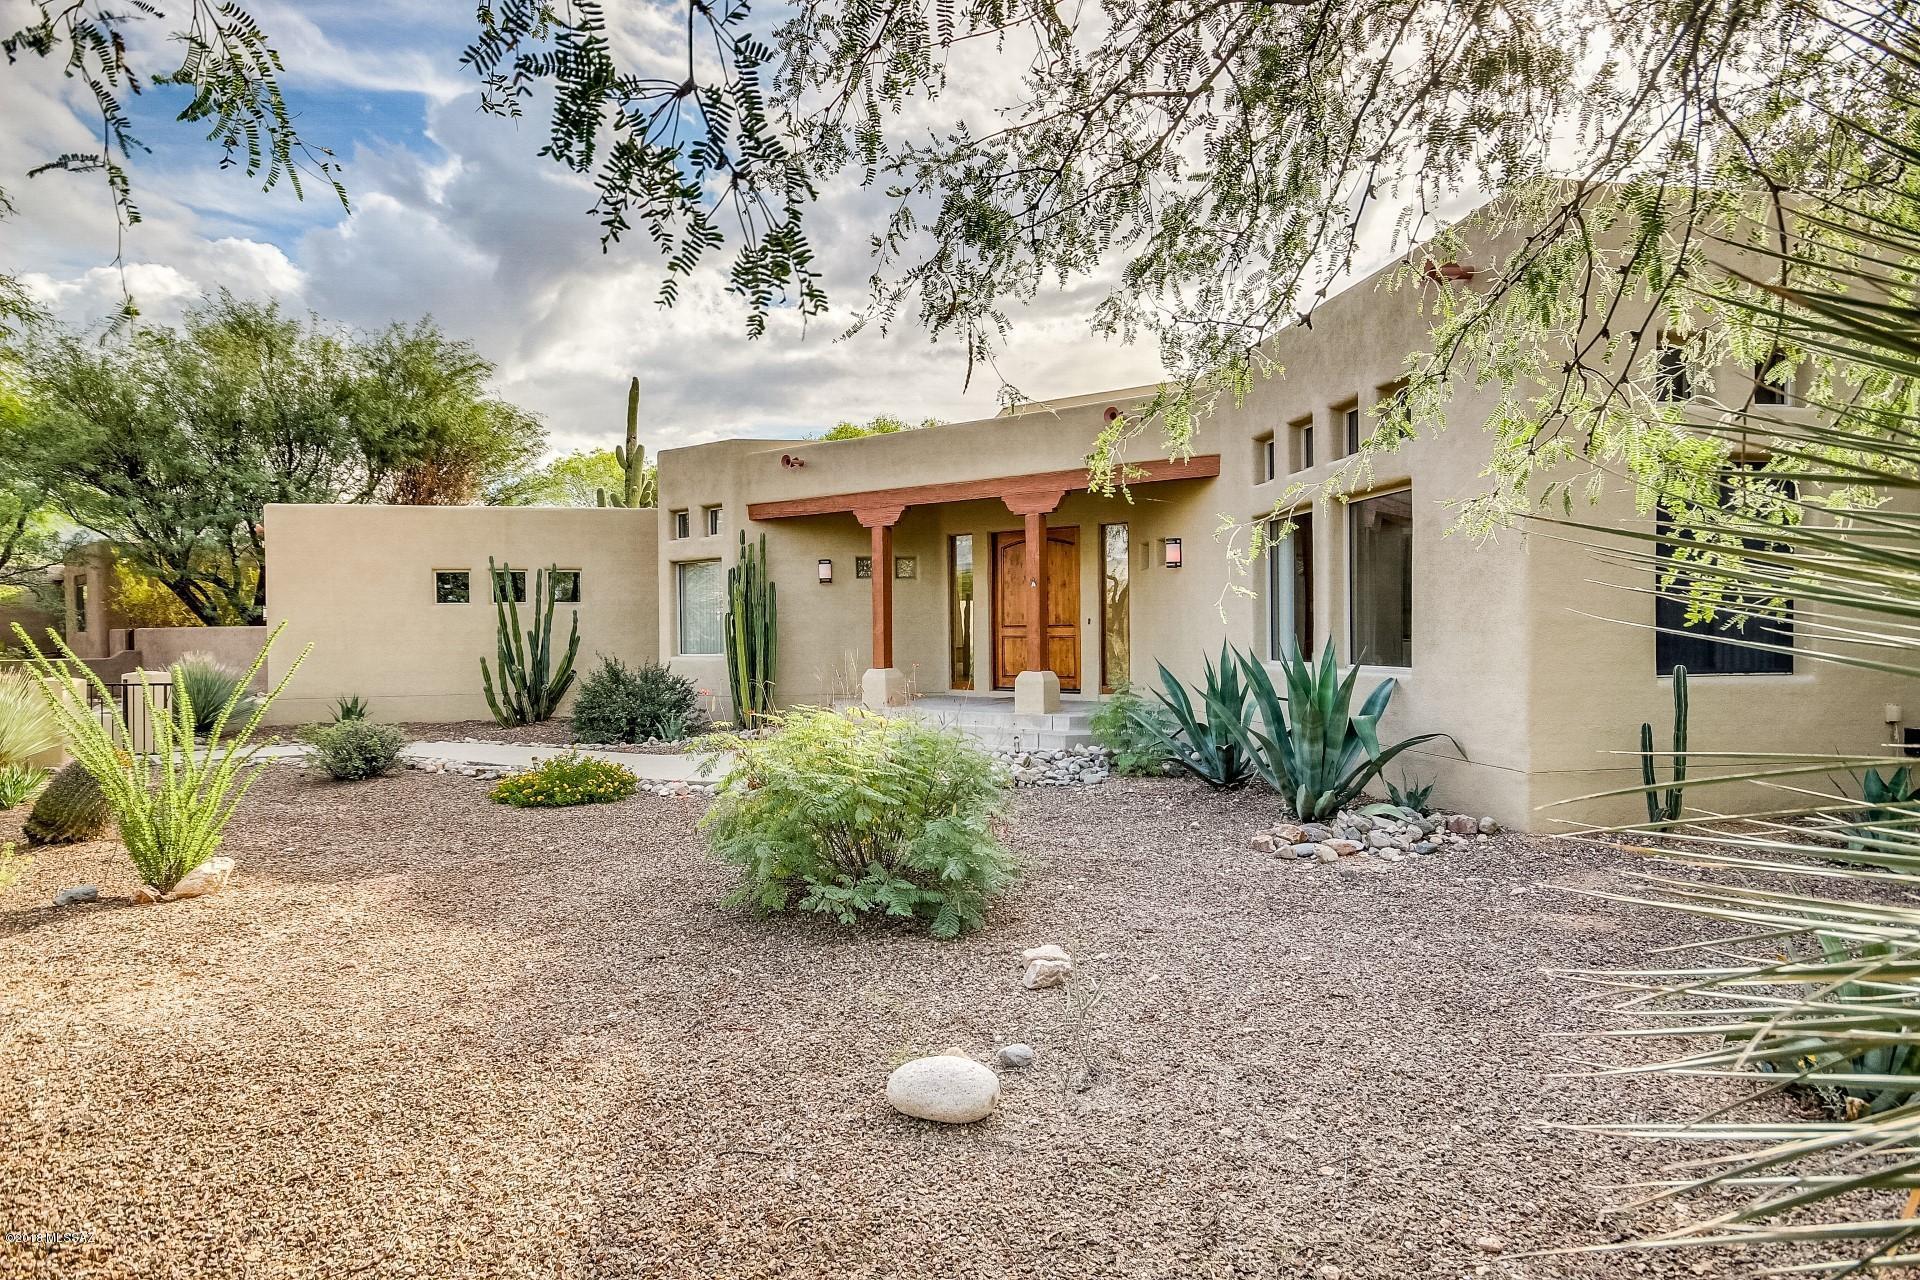 Photo of 12364 E Lou Bock Place, Tucson, AZ 85749